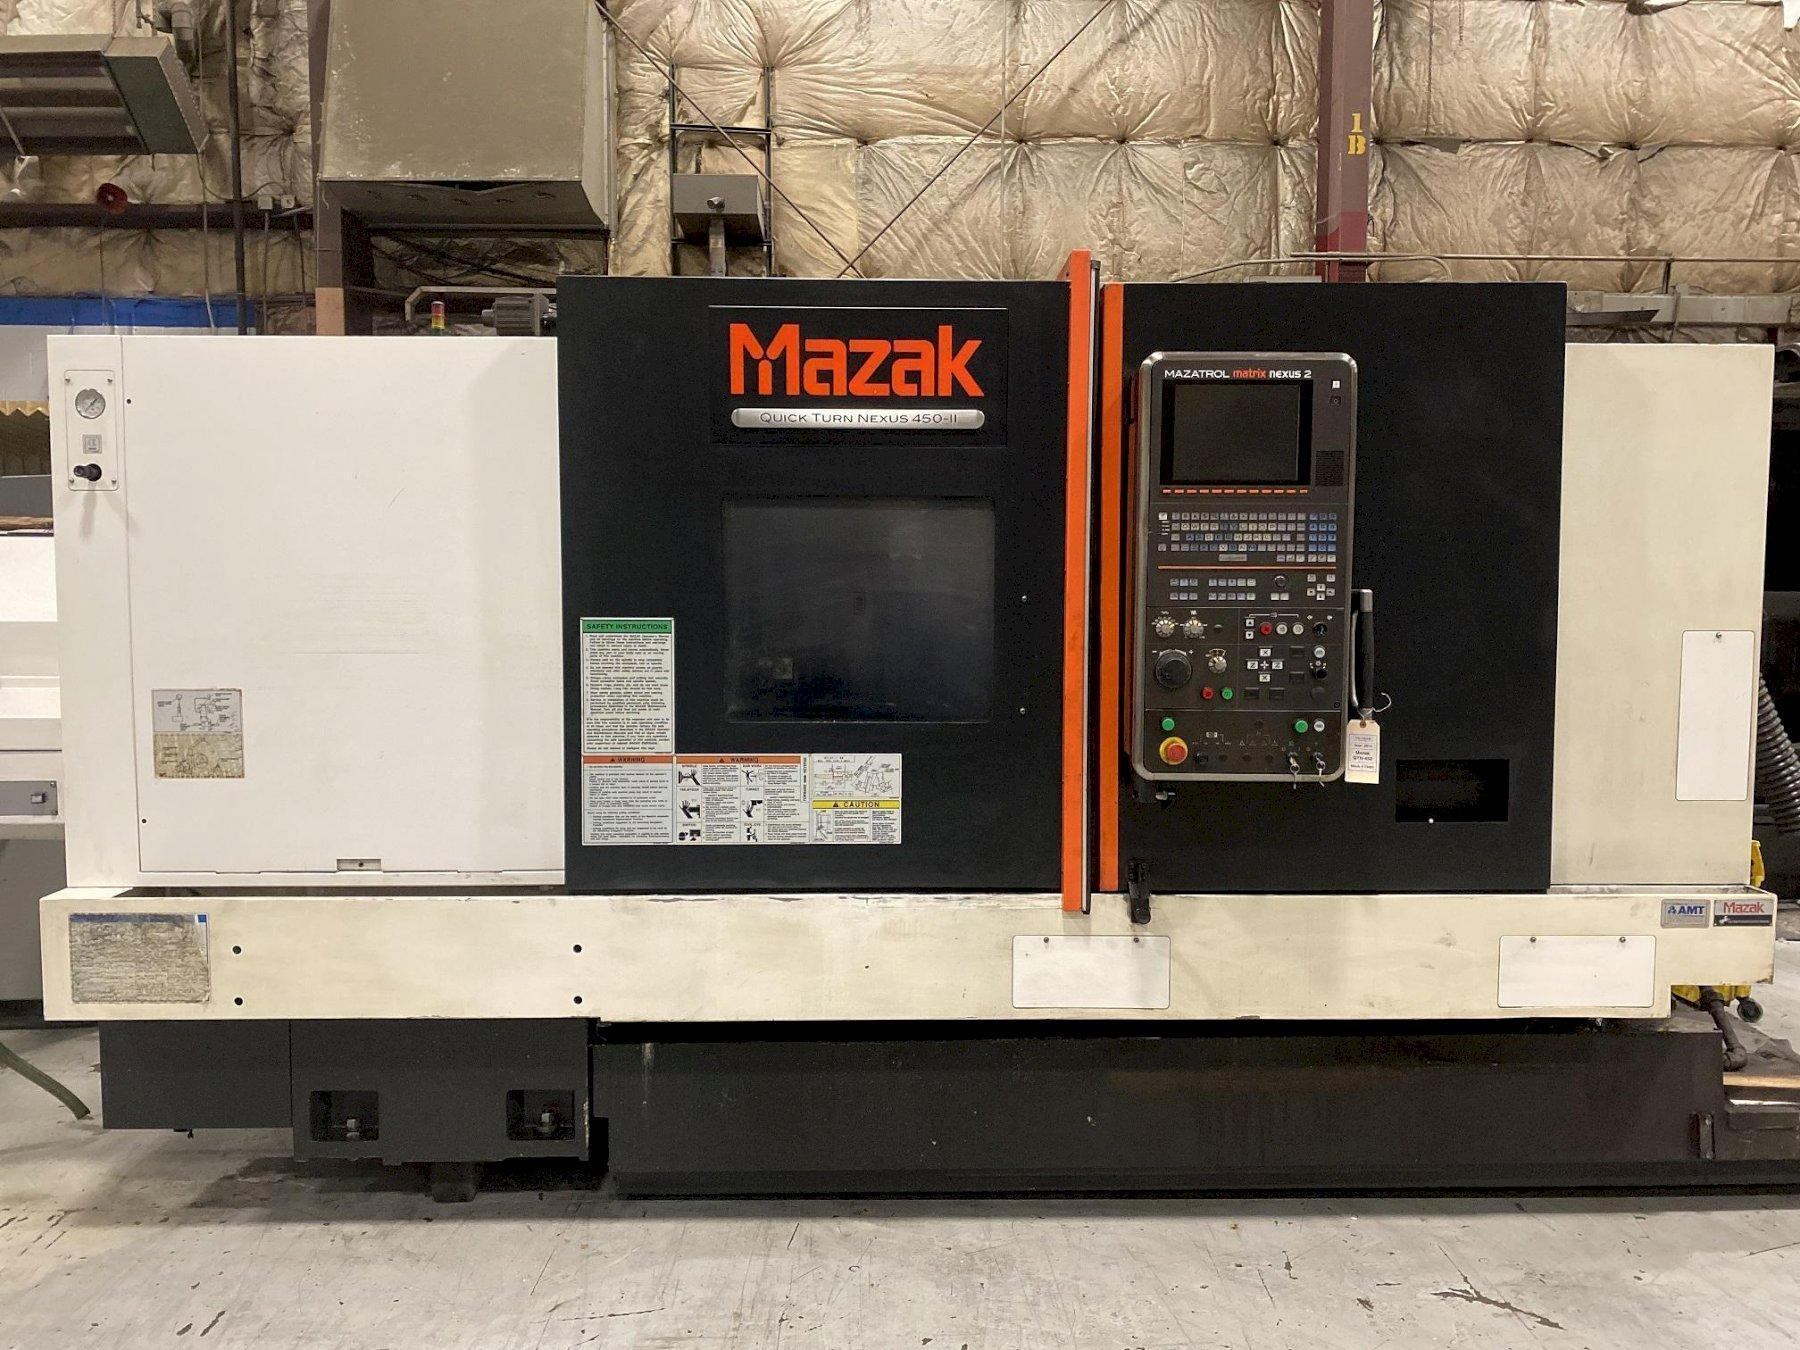 Mazak QTN450II CNC Lathe, Matrix Nexus 2 Control, 21